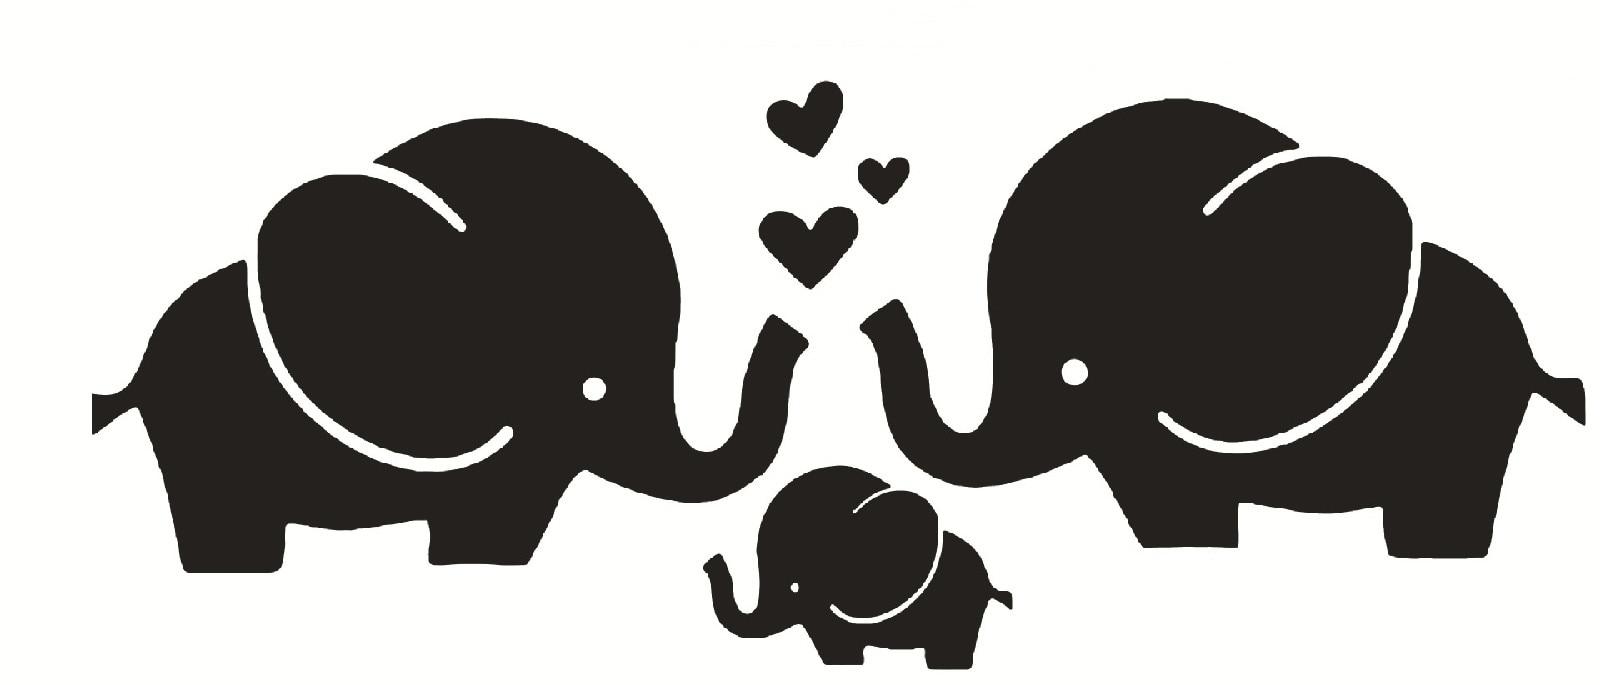 Home Decor Elephants Bonding Asian Elephants Houston Zoo